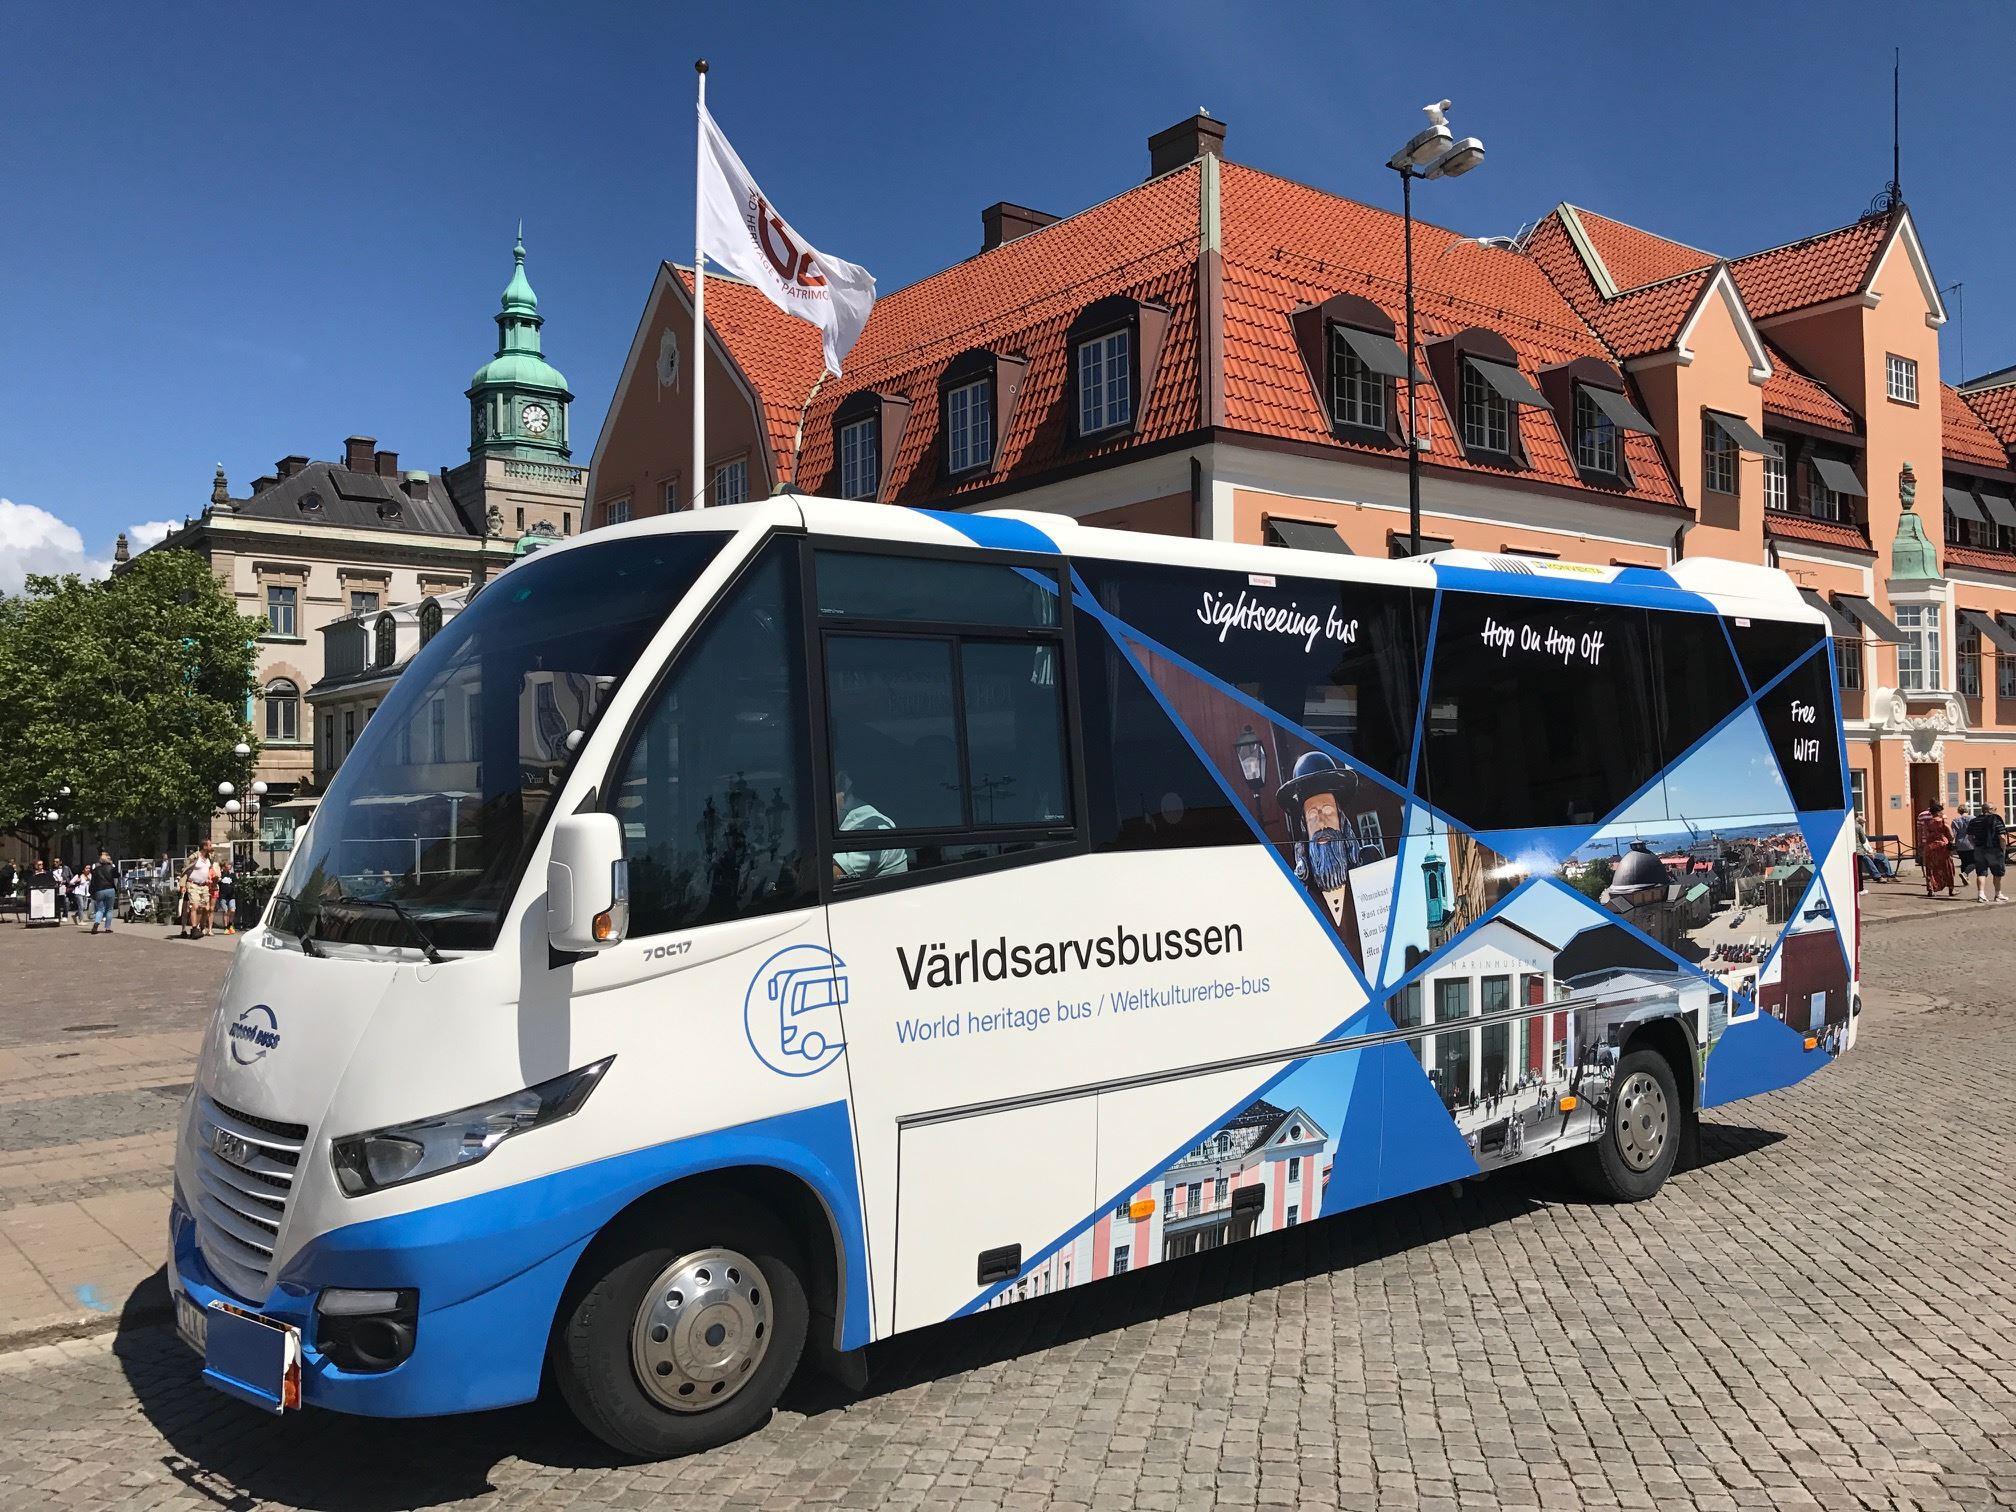 Sightseeingbus - The world heritage bus